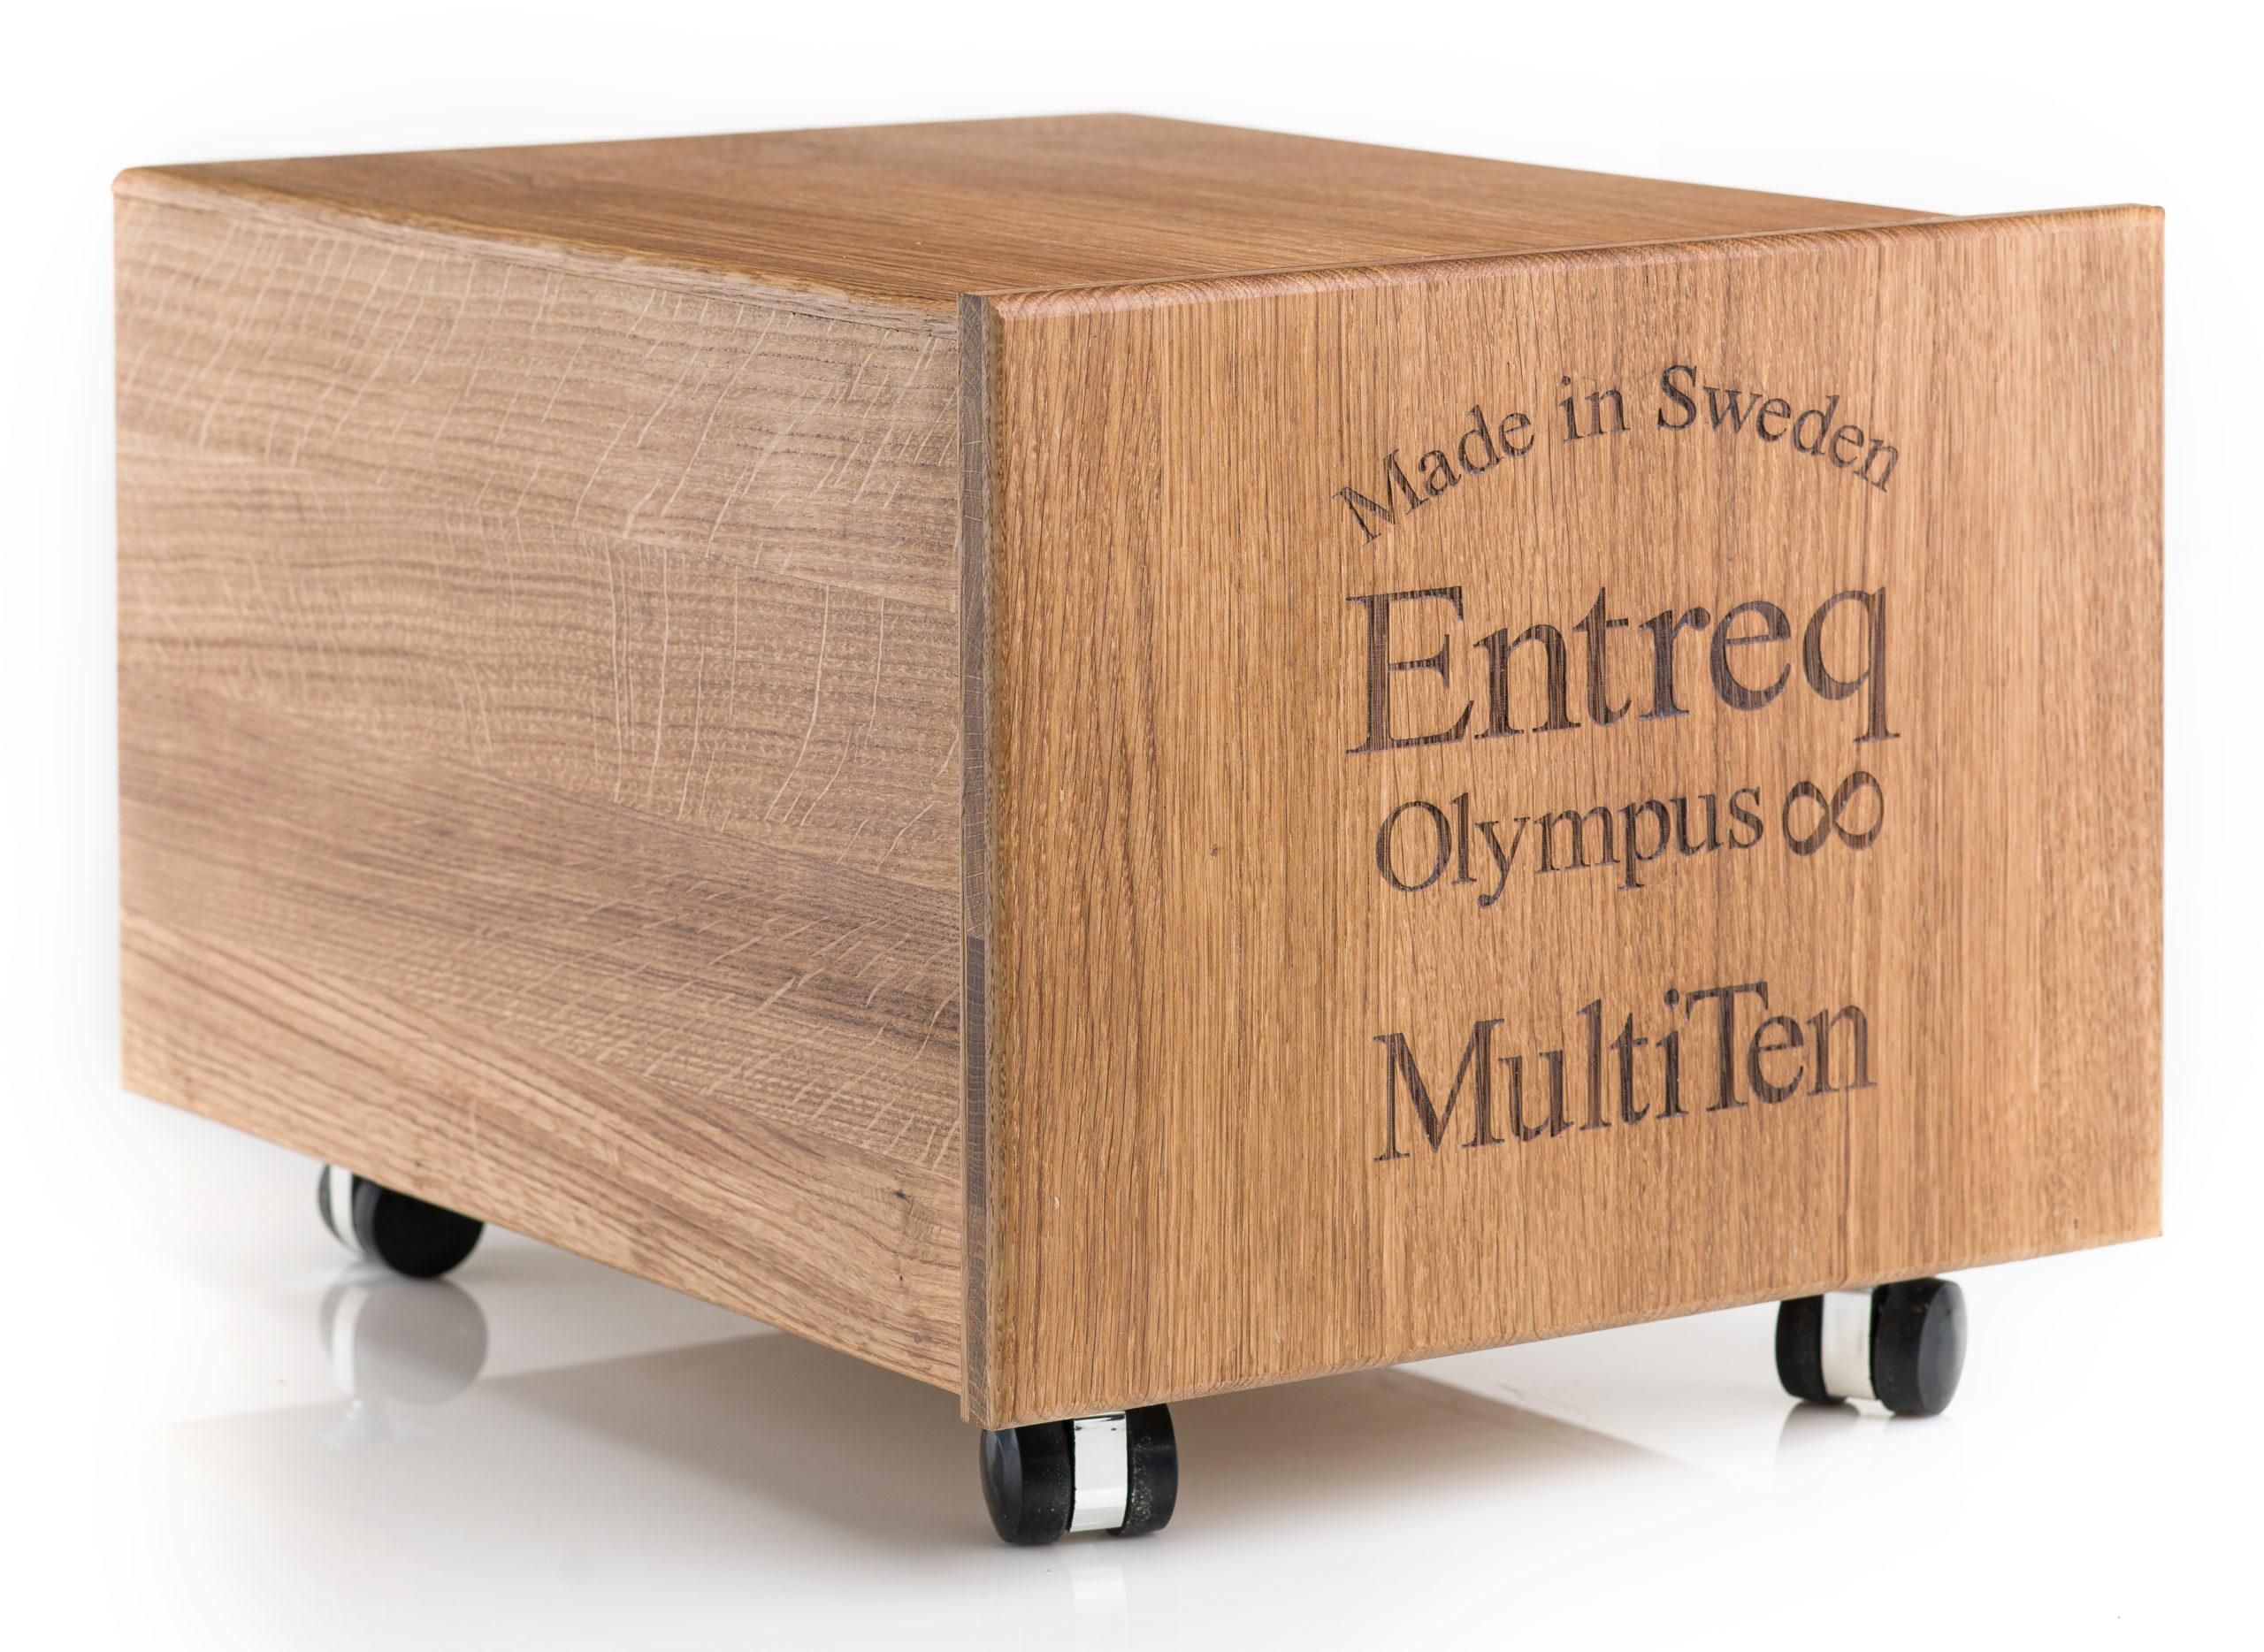 Entreq Olympus TenTen @ Audio Therapy